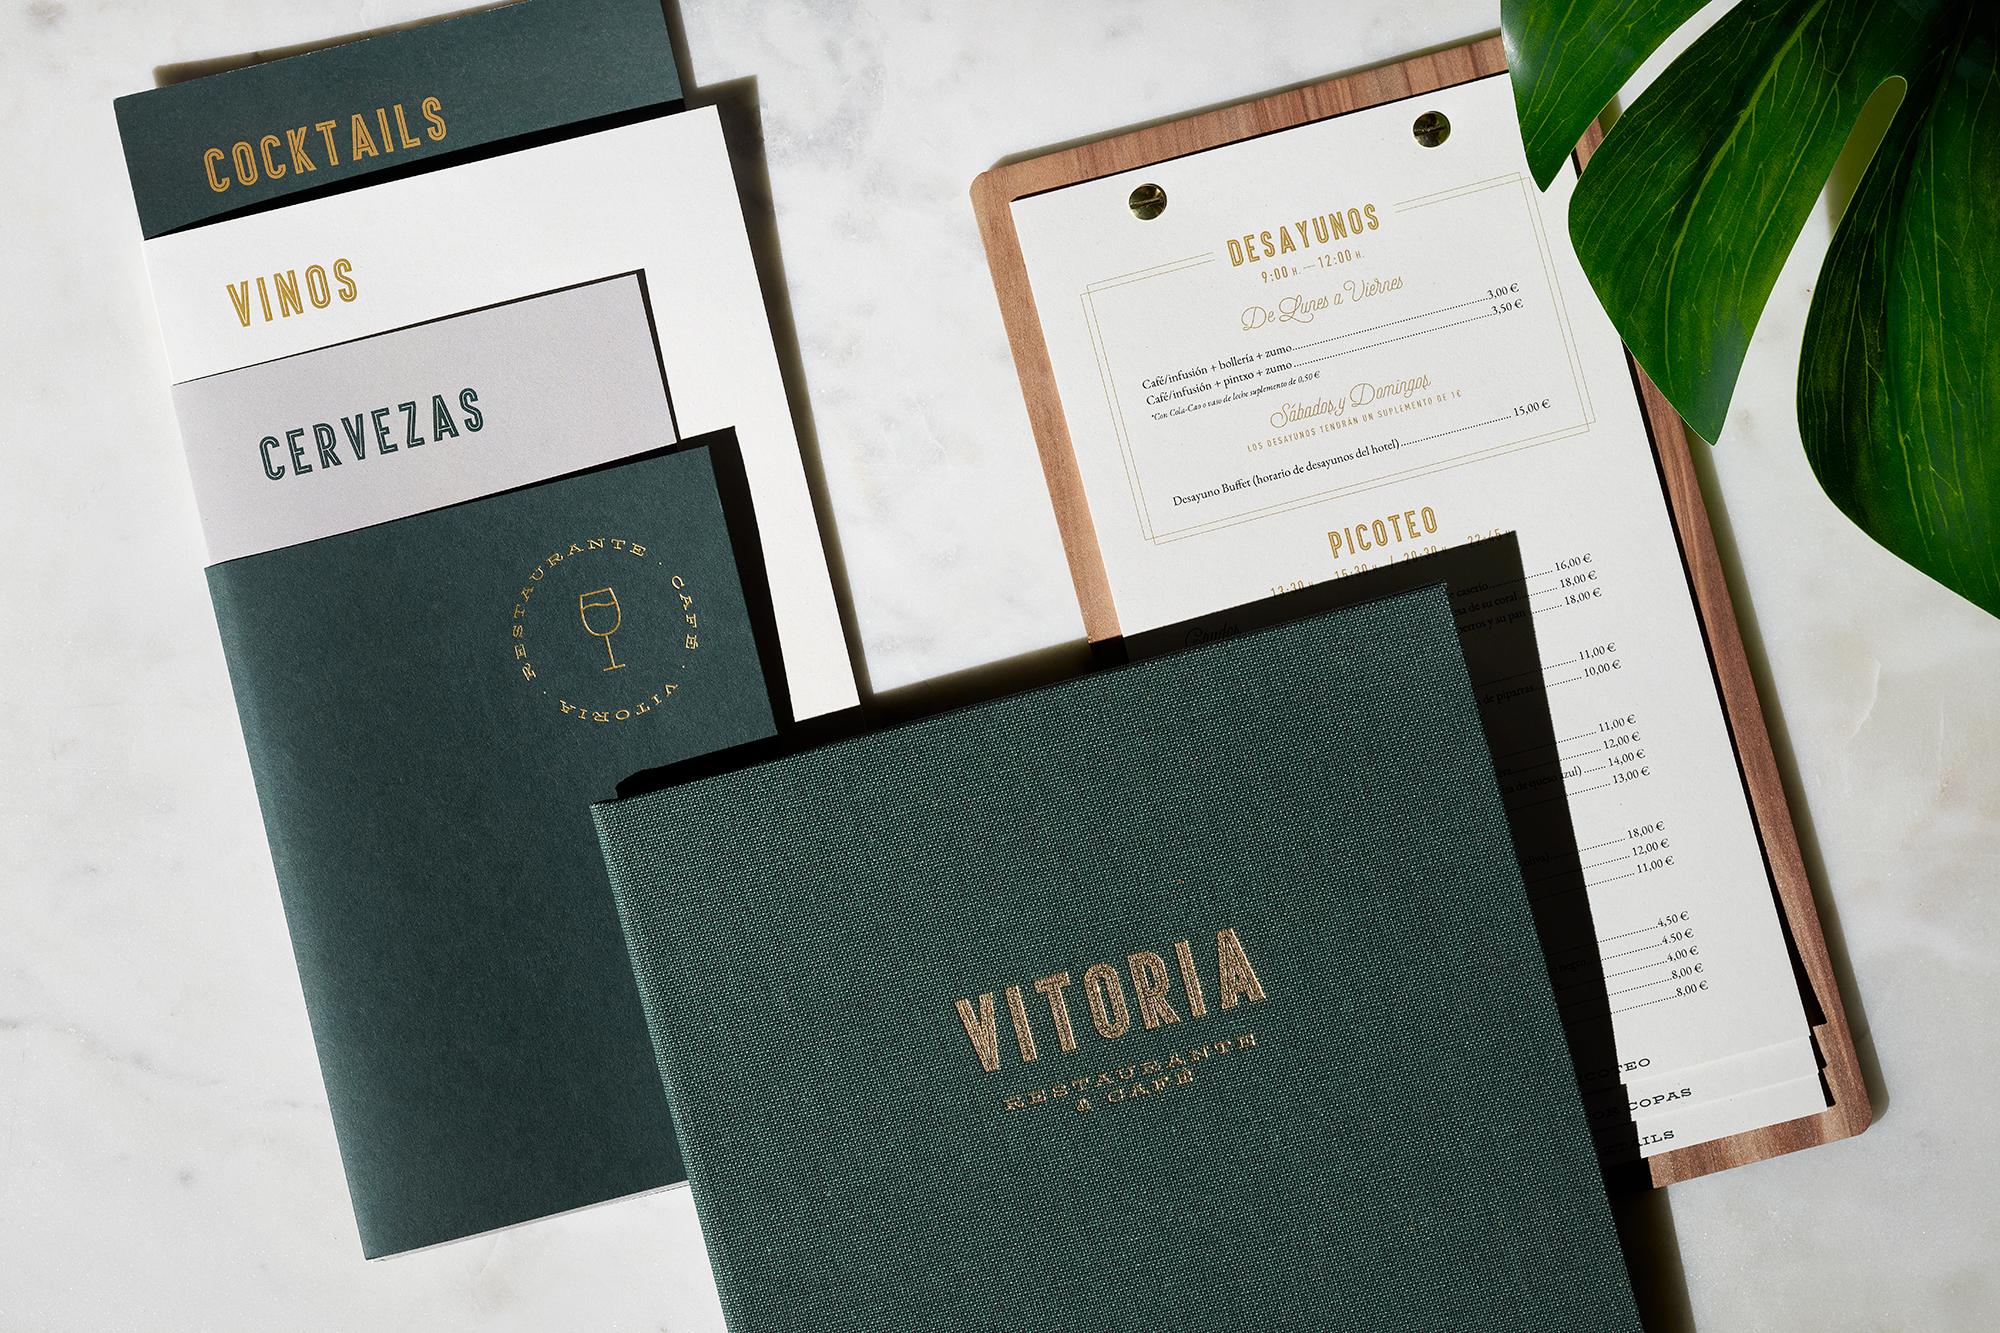 restaurante-vitoria-cartas